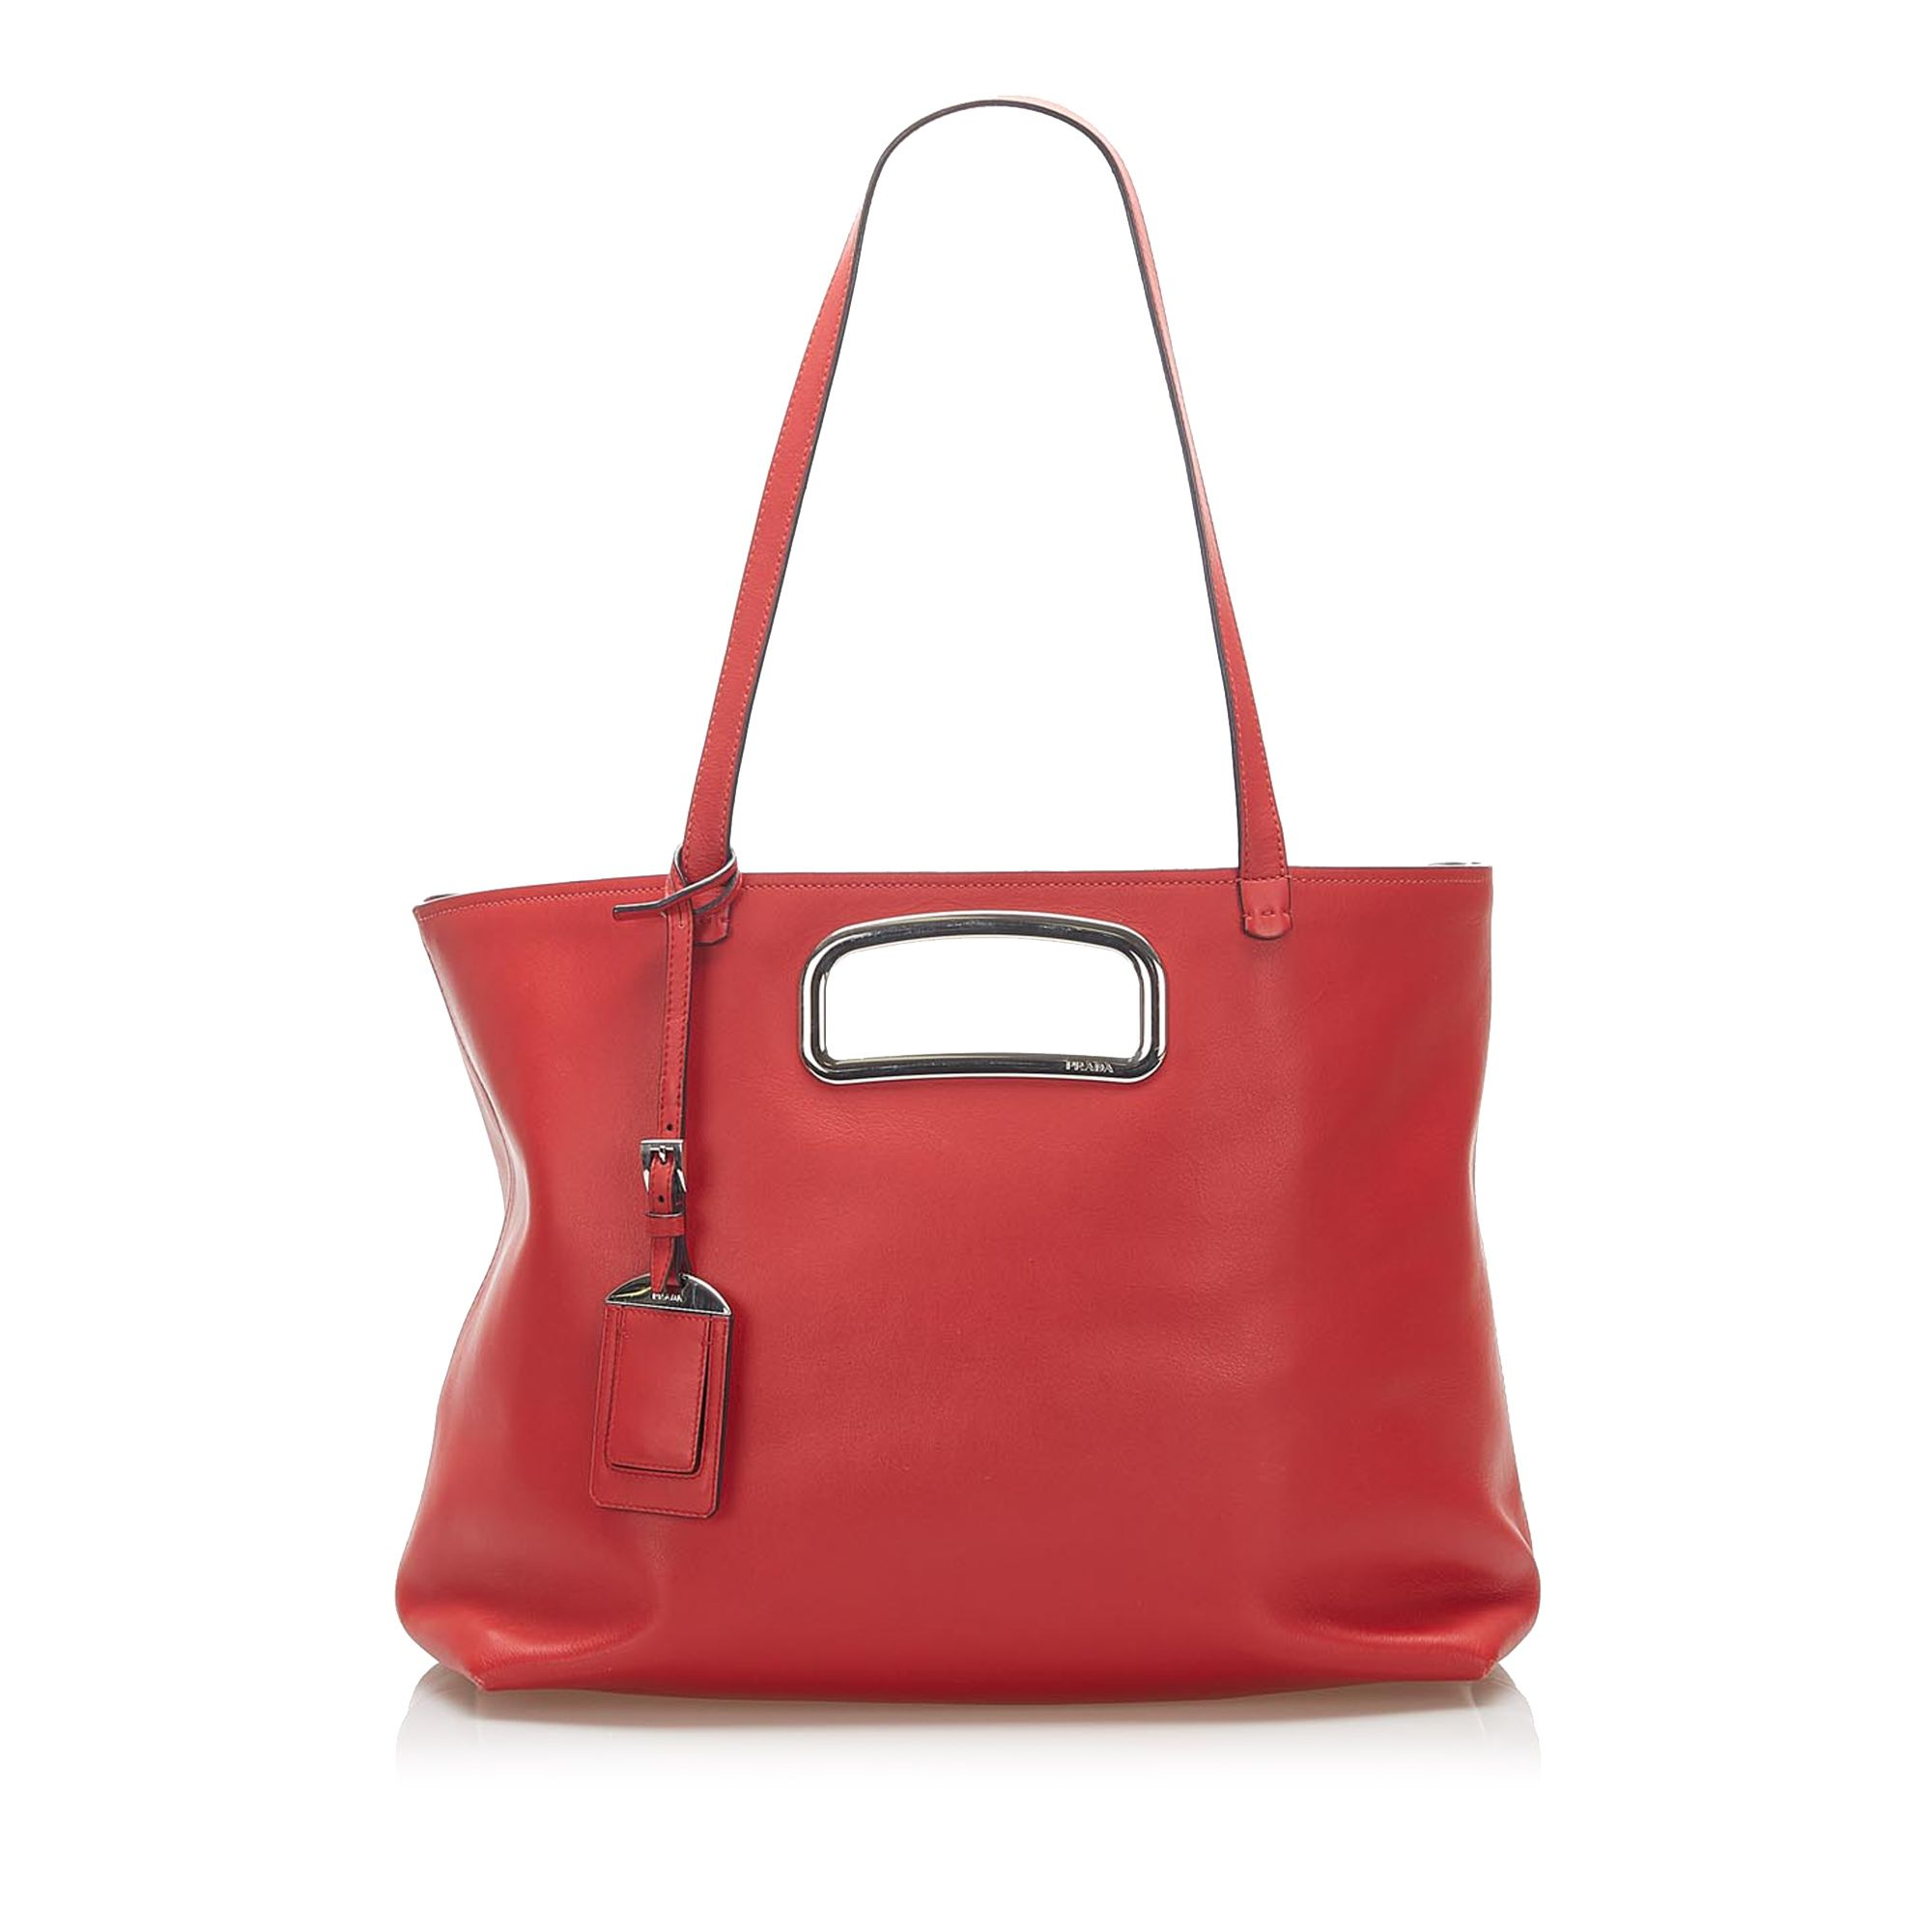 Vintage Prada Leather Satchel Red